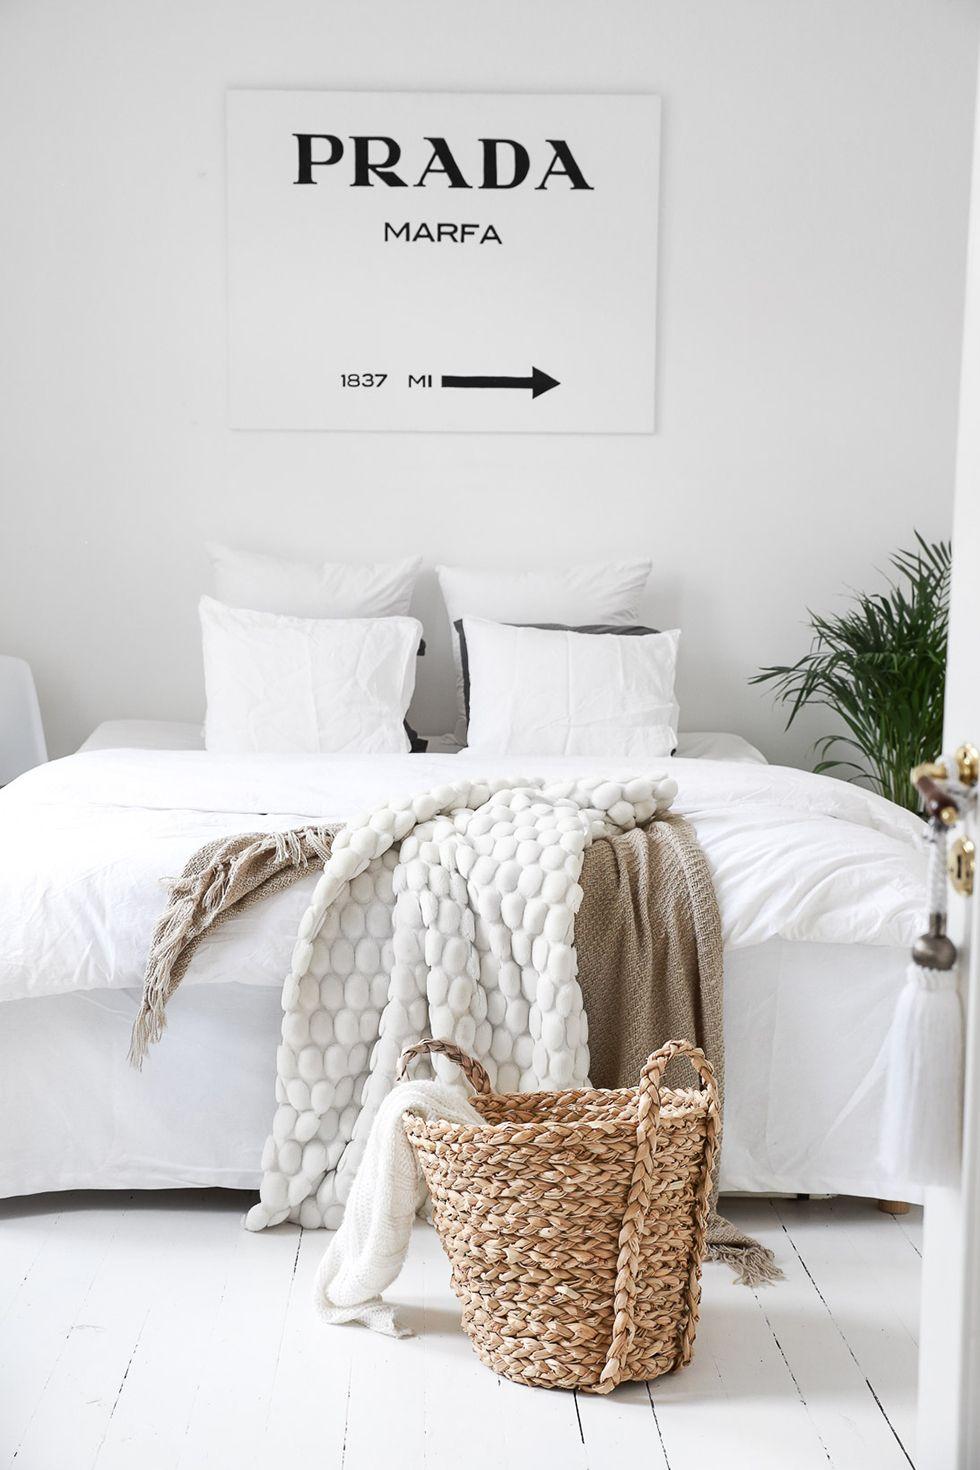 33 All White Room Ideas For Decor Minimalists Stylecaster Ralotibetanrugs